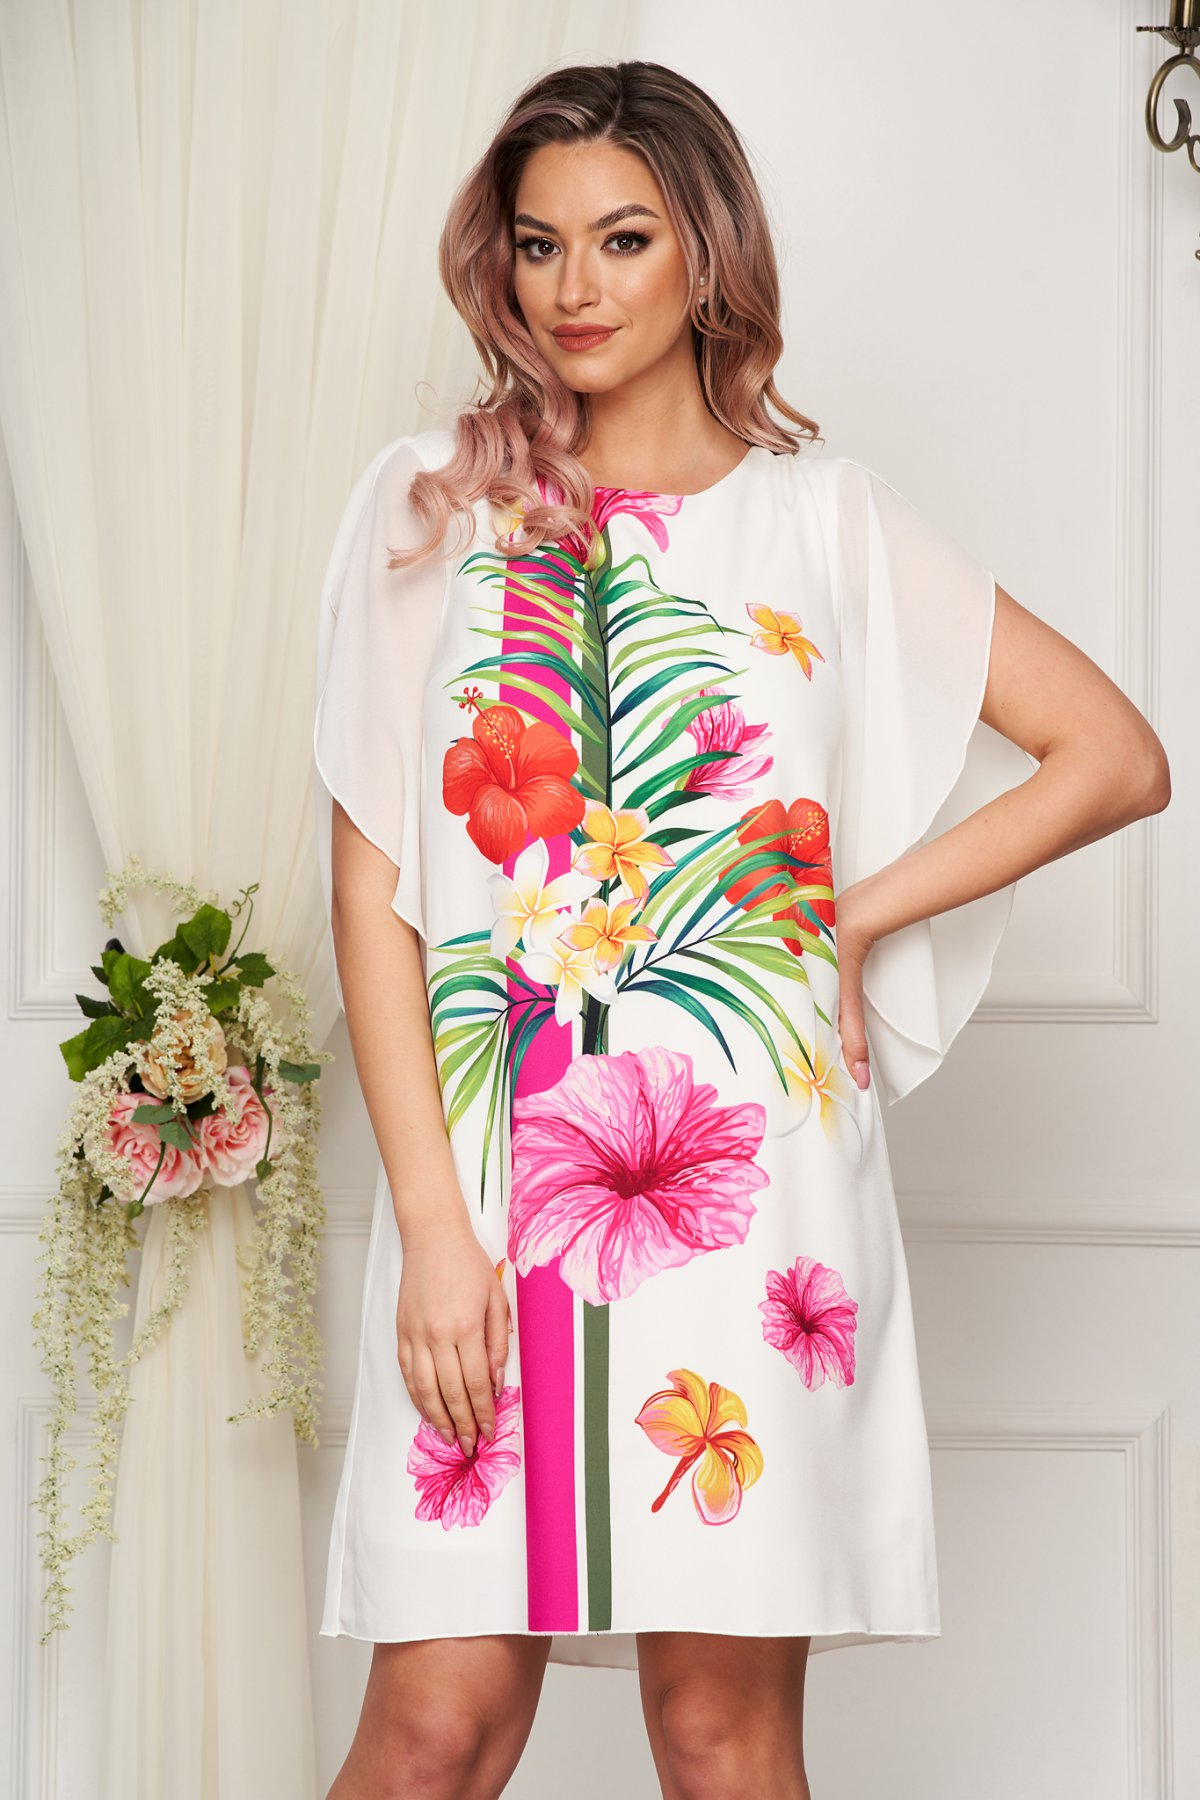 Rochie StarShinerS ivoire eleganta cu croi larg cu maneci din voal din stofa subtire usor elastica cu imprimeuri florale